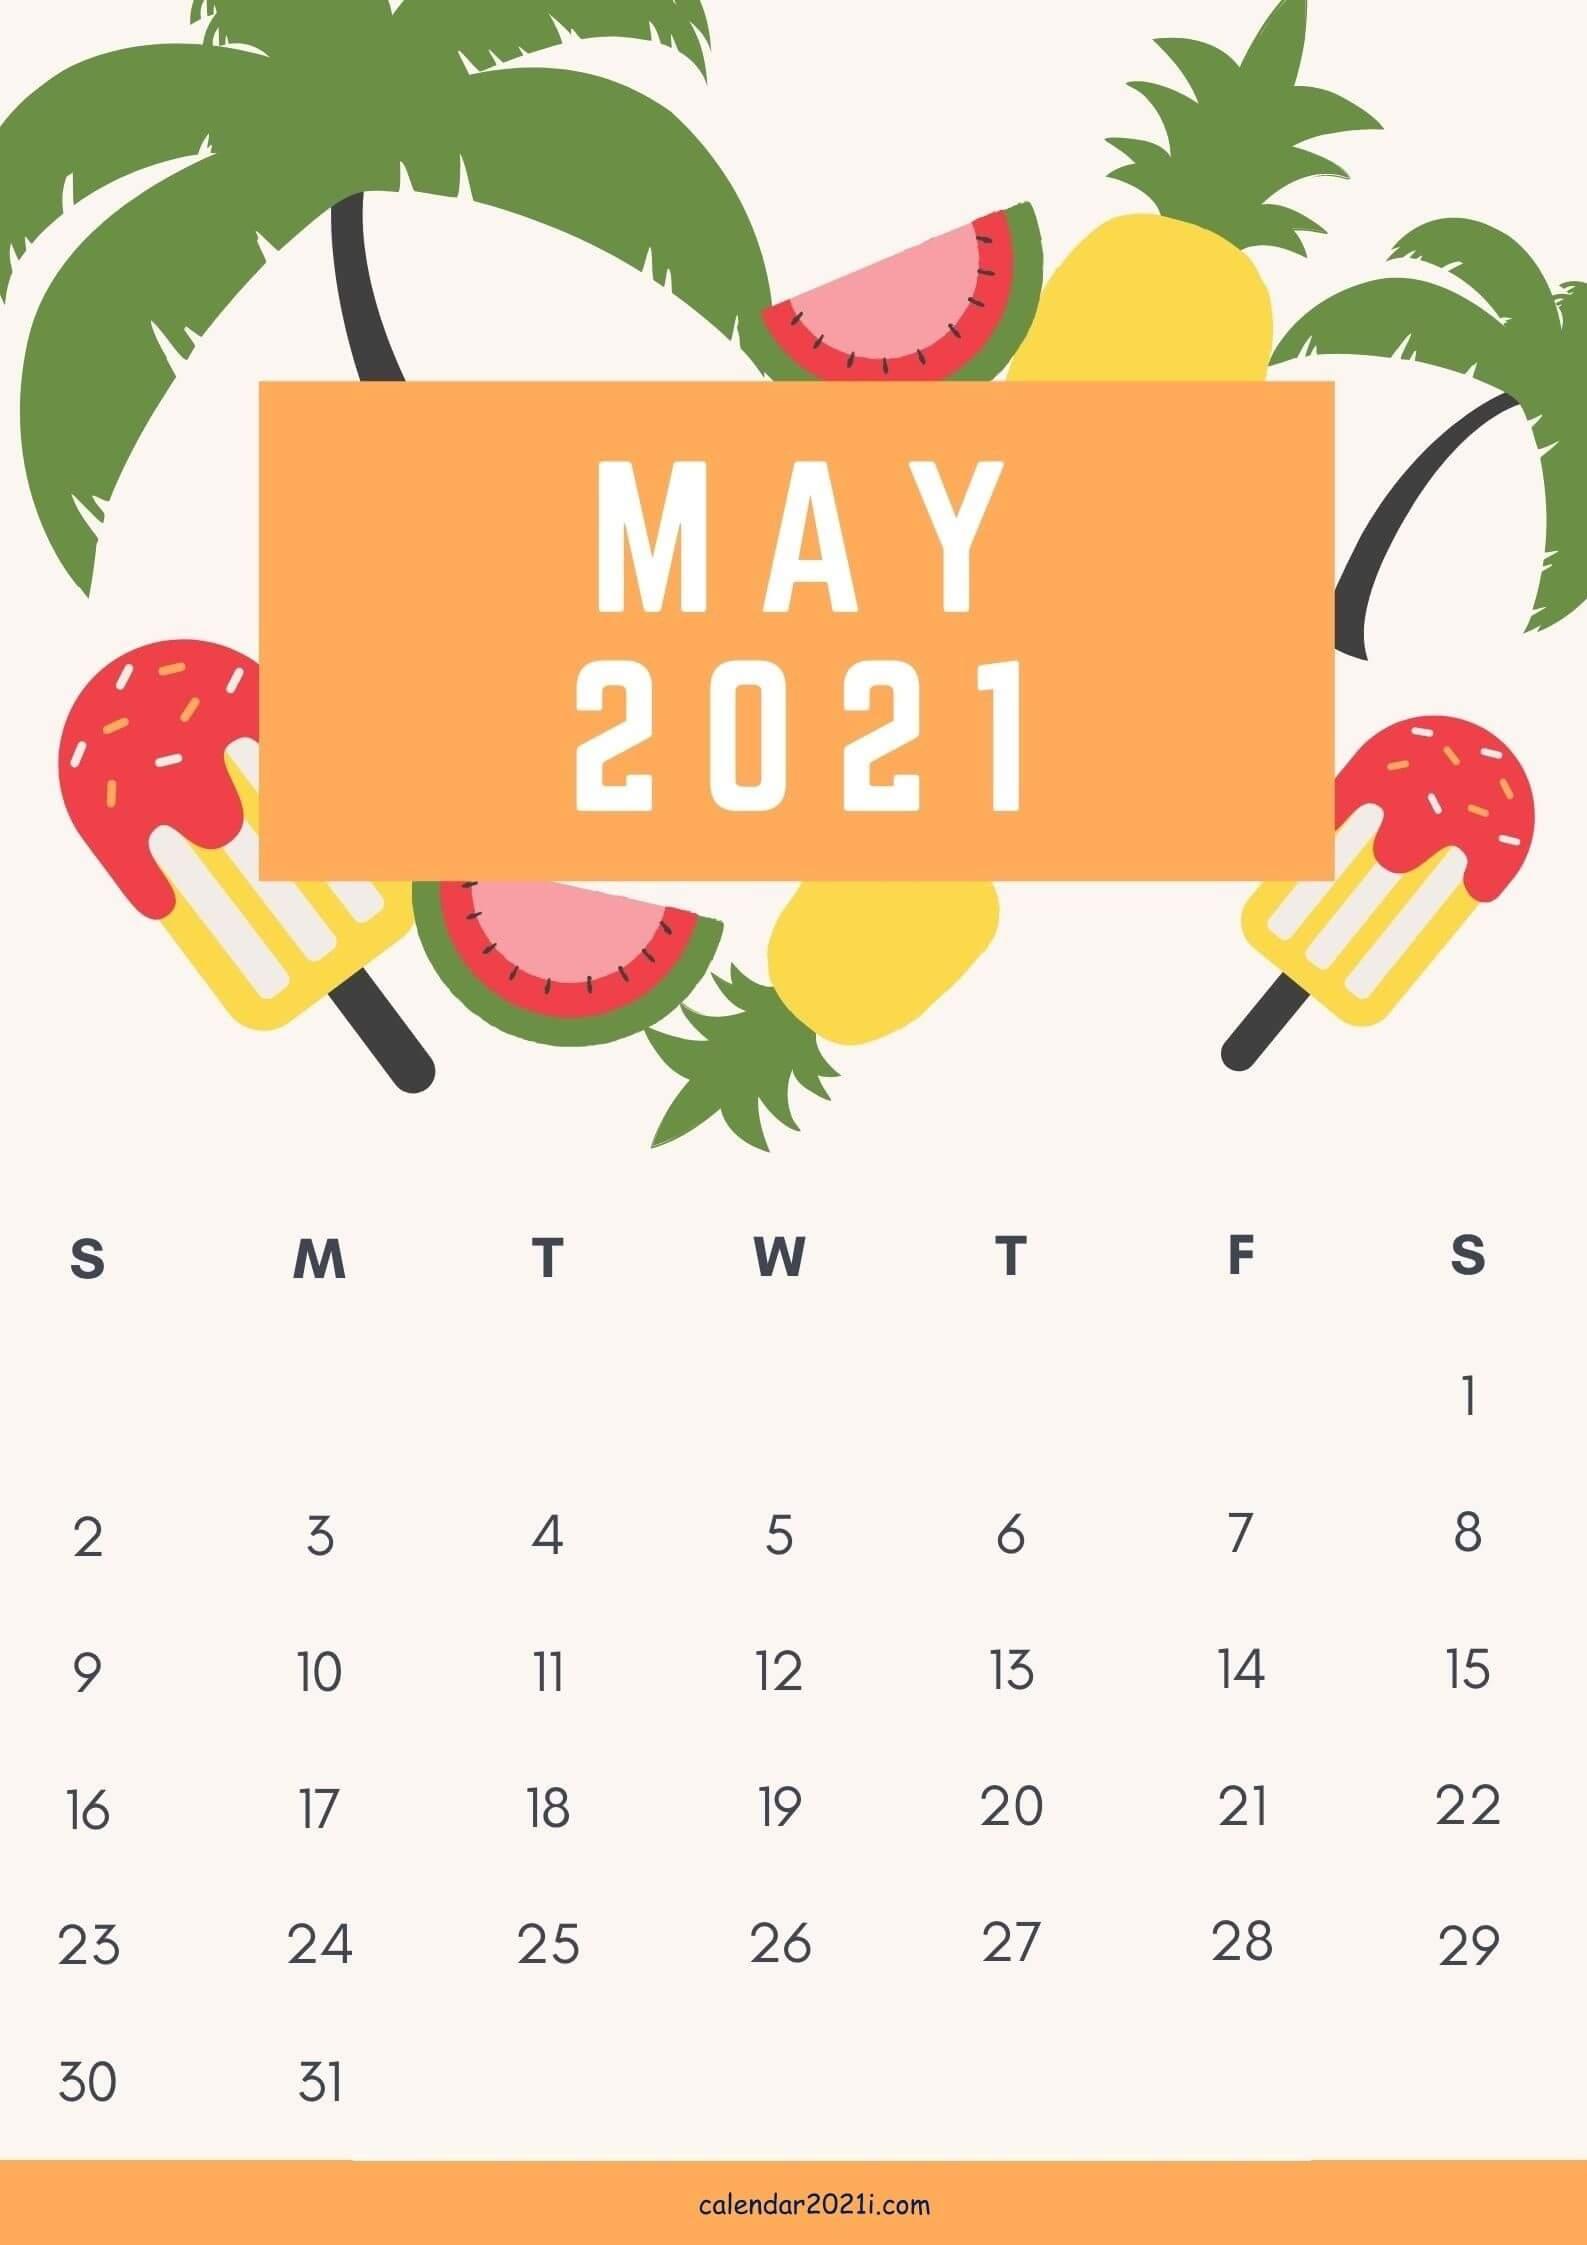 May 2021 iPhone Calendar Wallpaper